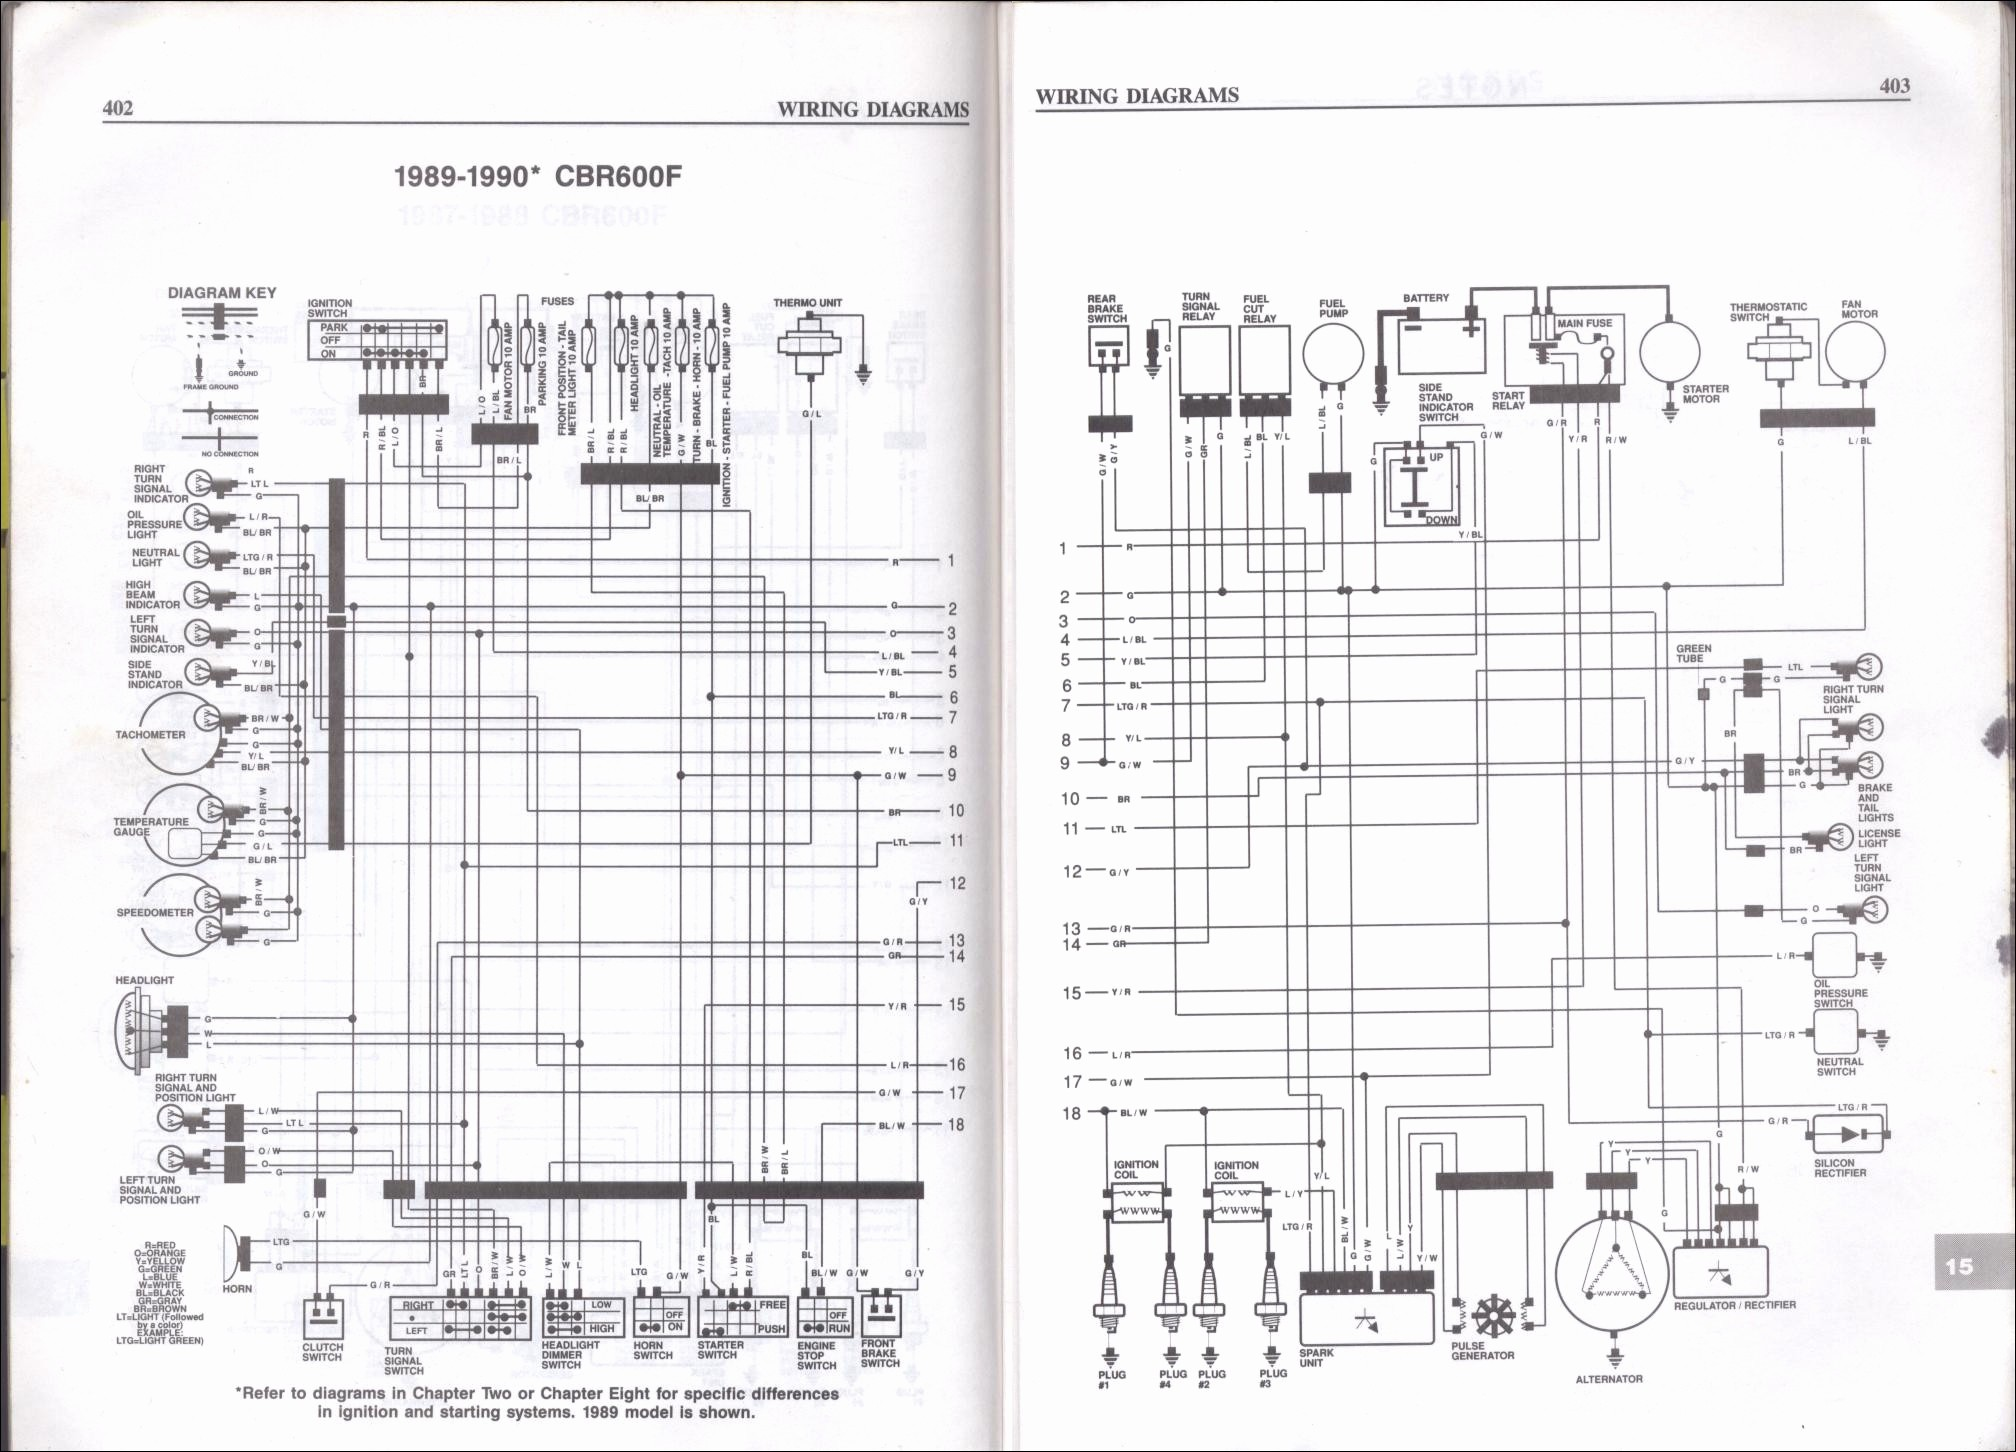 wiring diagram program wiring diagram software new wiring diagram honda c70 inspirationa index 0 0d 9g